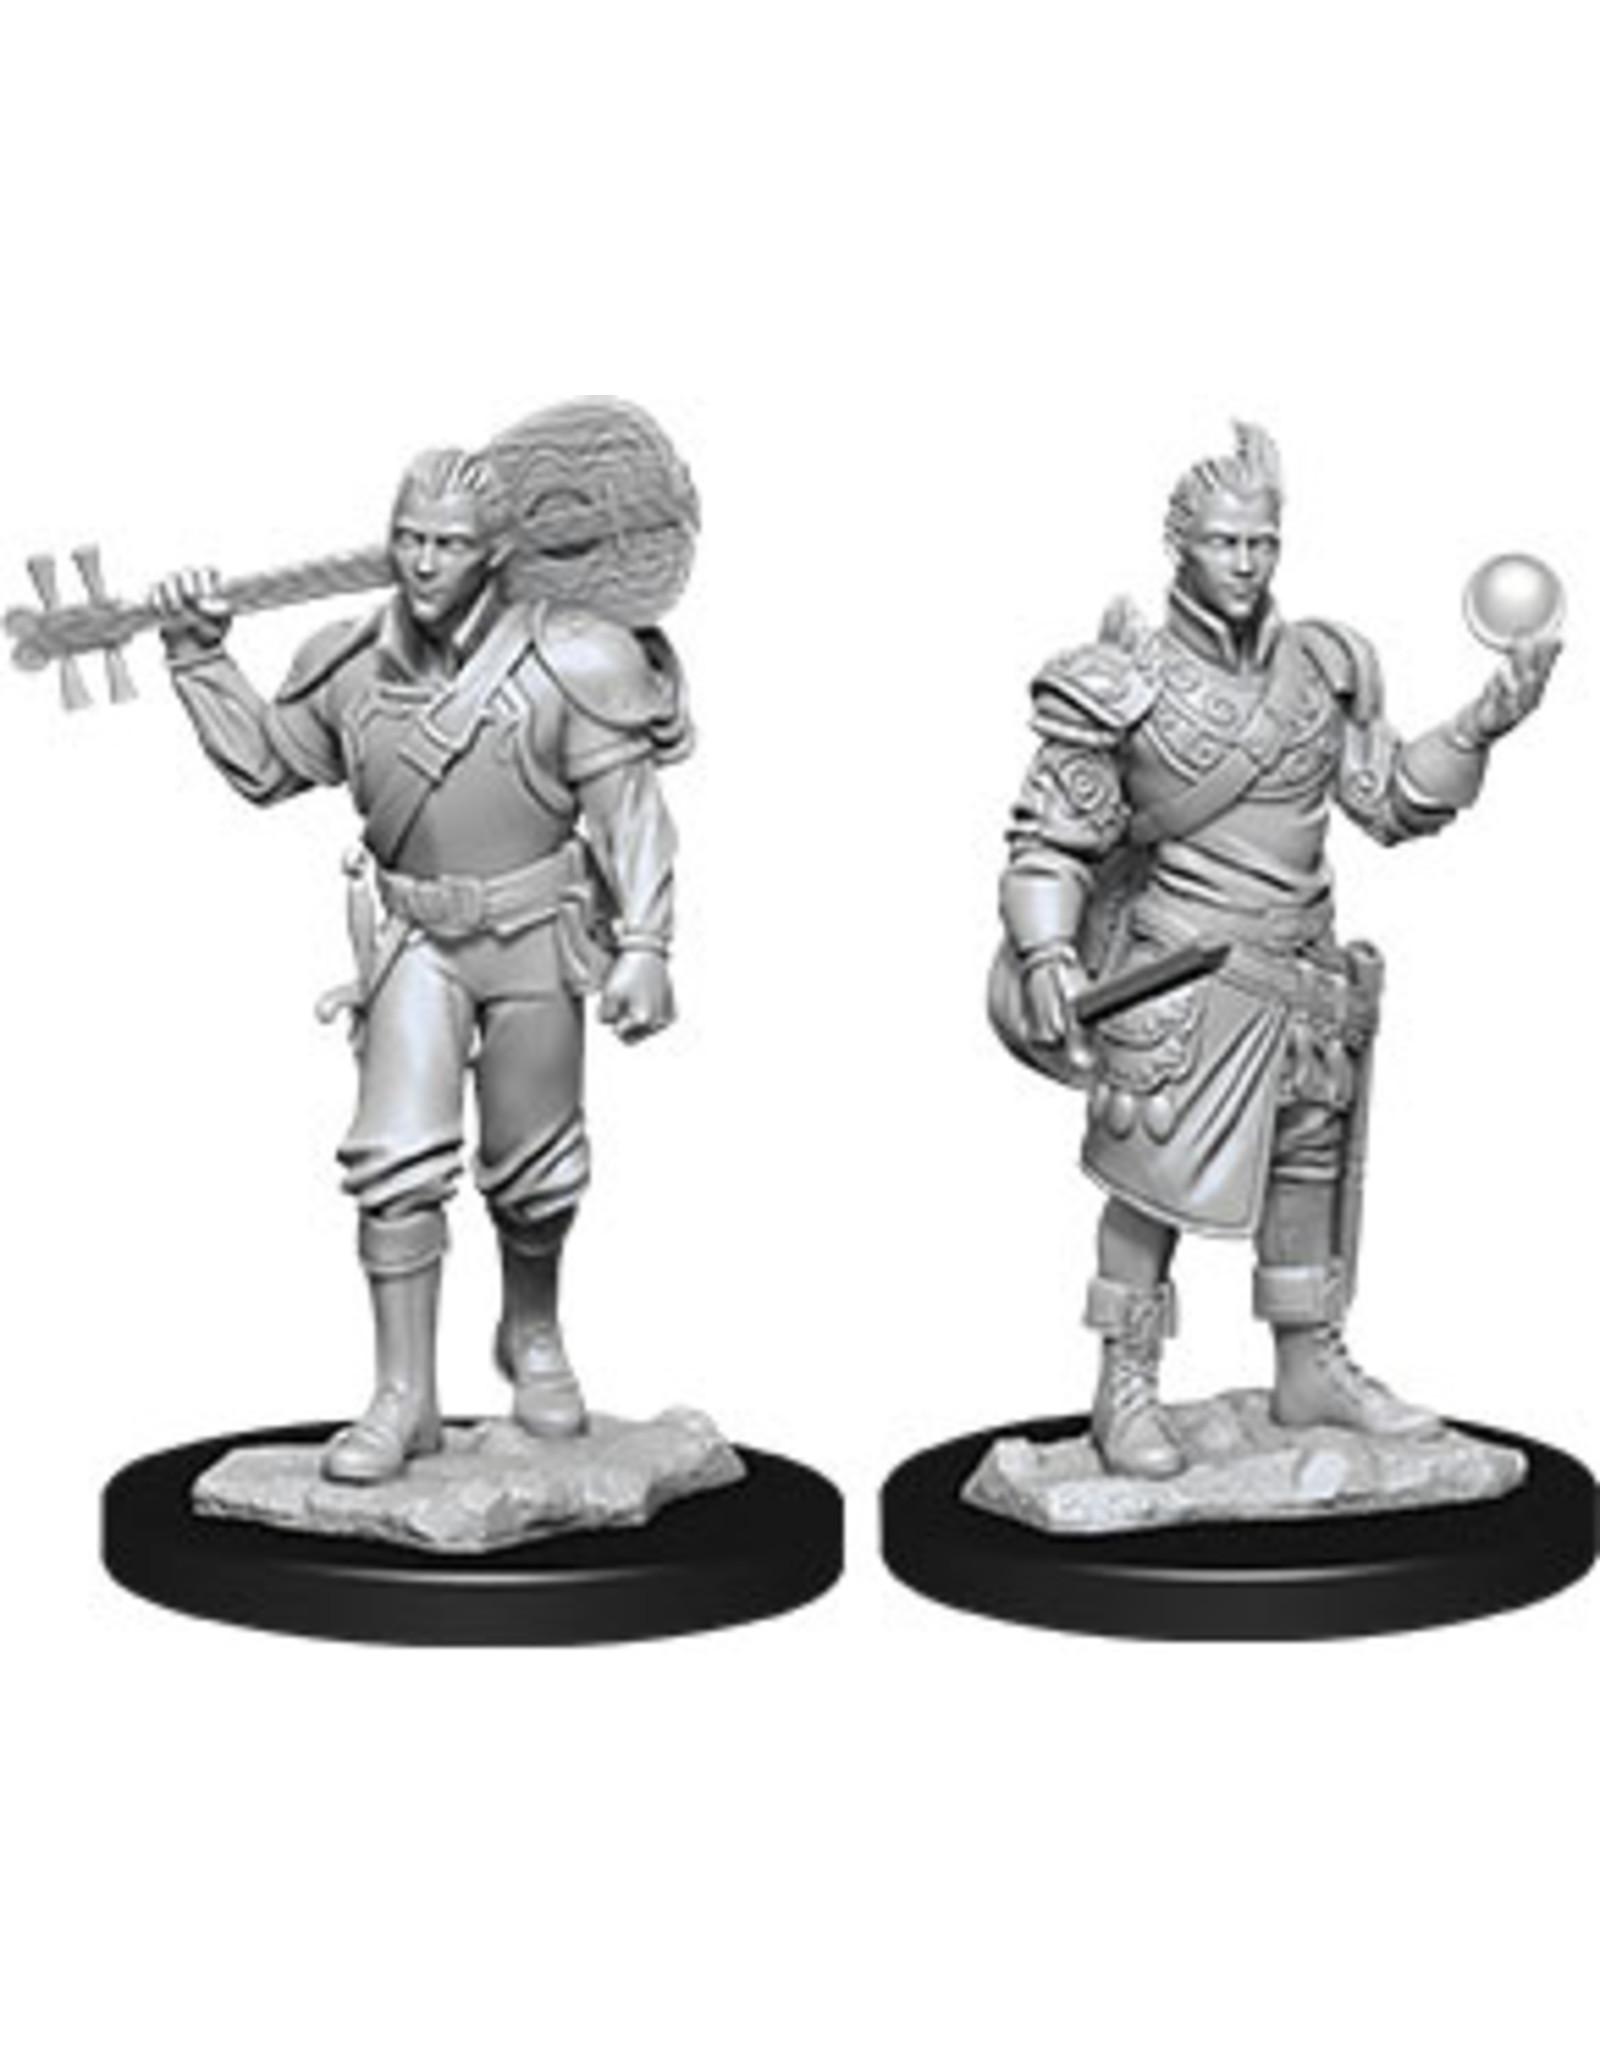 WizKids Dungeons & Dragons Nolzur`s Marvelous Unpainted Miniatures: W12 Male Half-Elf Bard